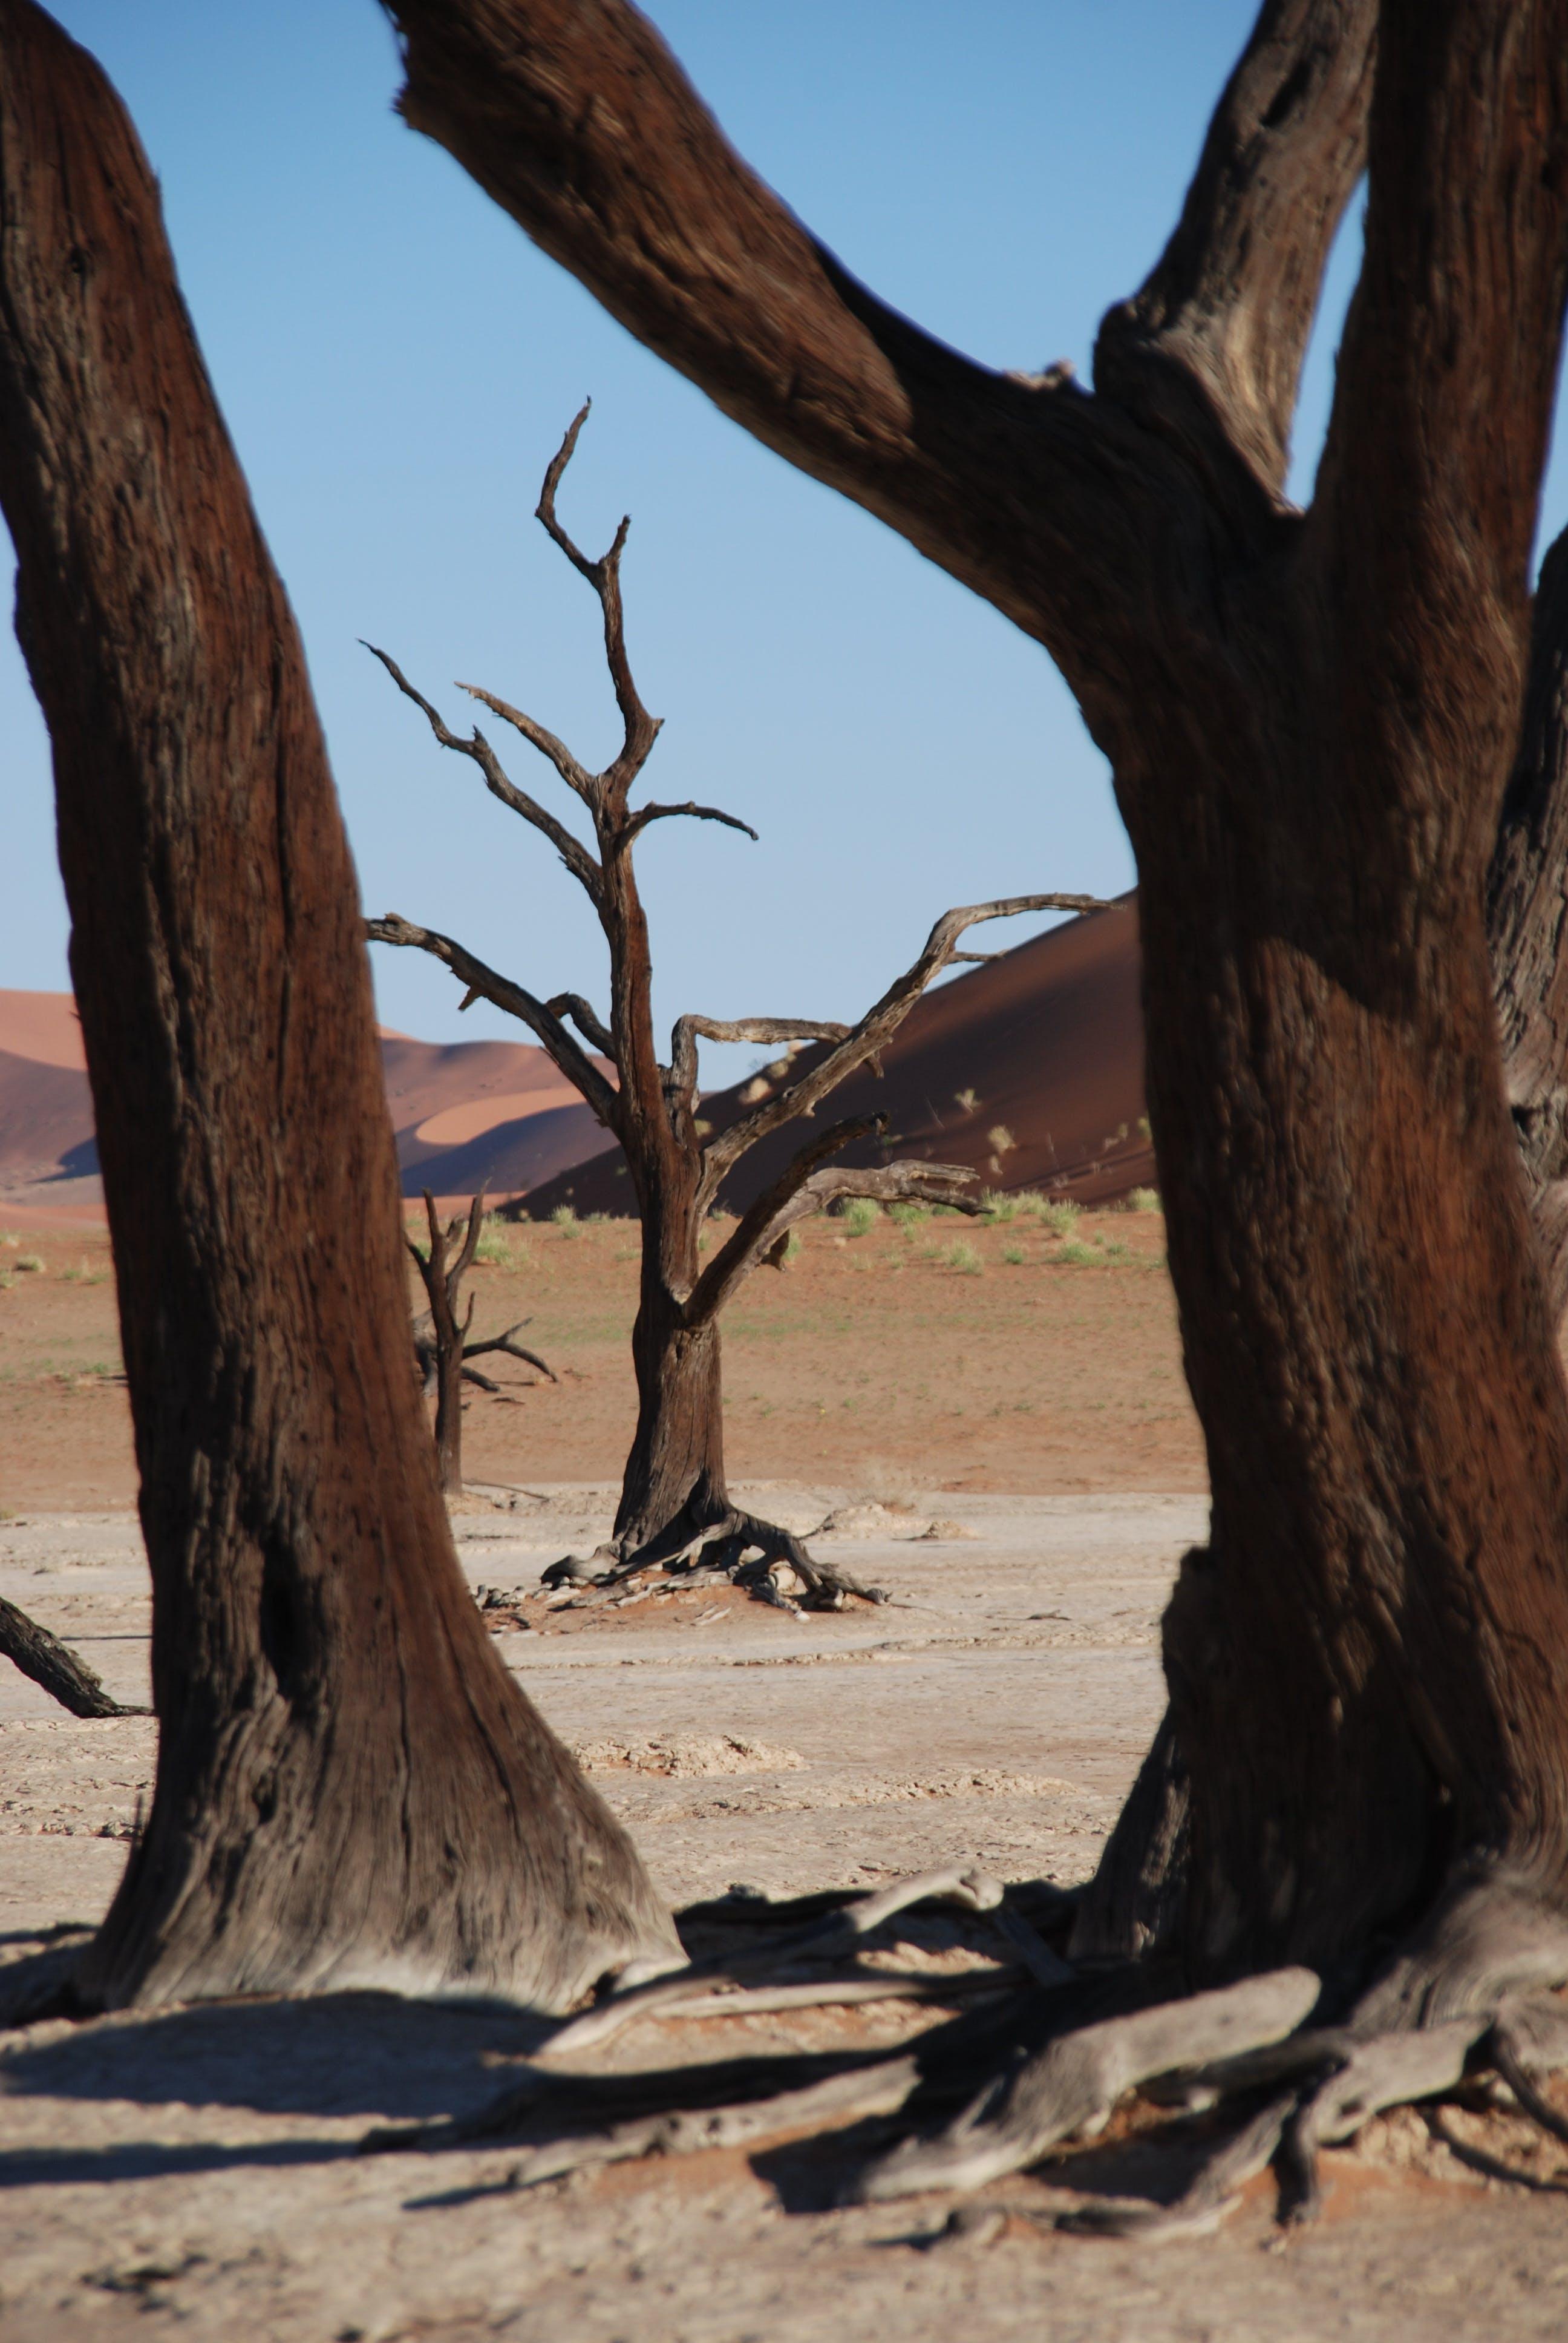 Brown Tree Near Desert during Daytime